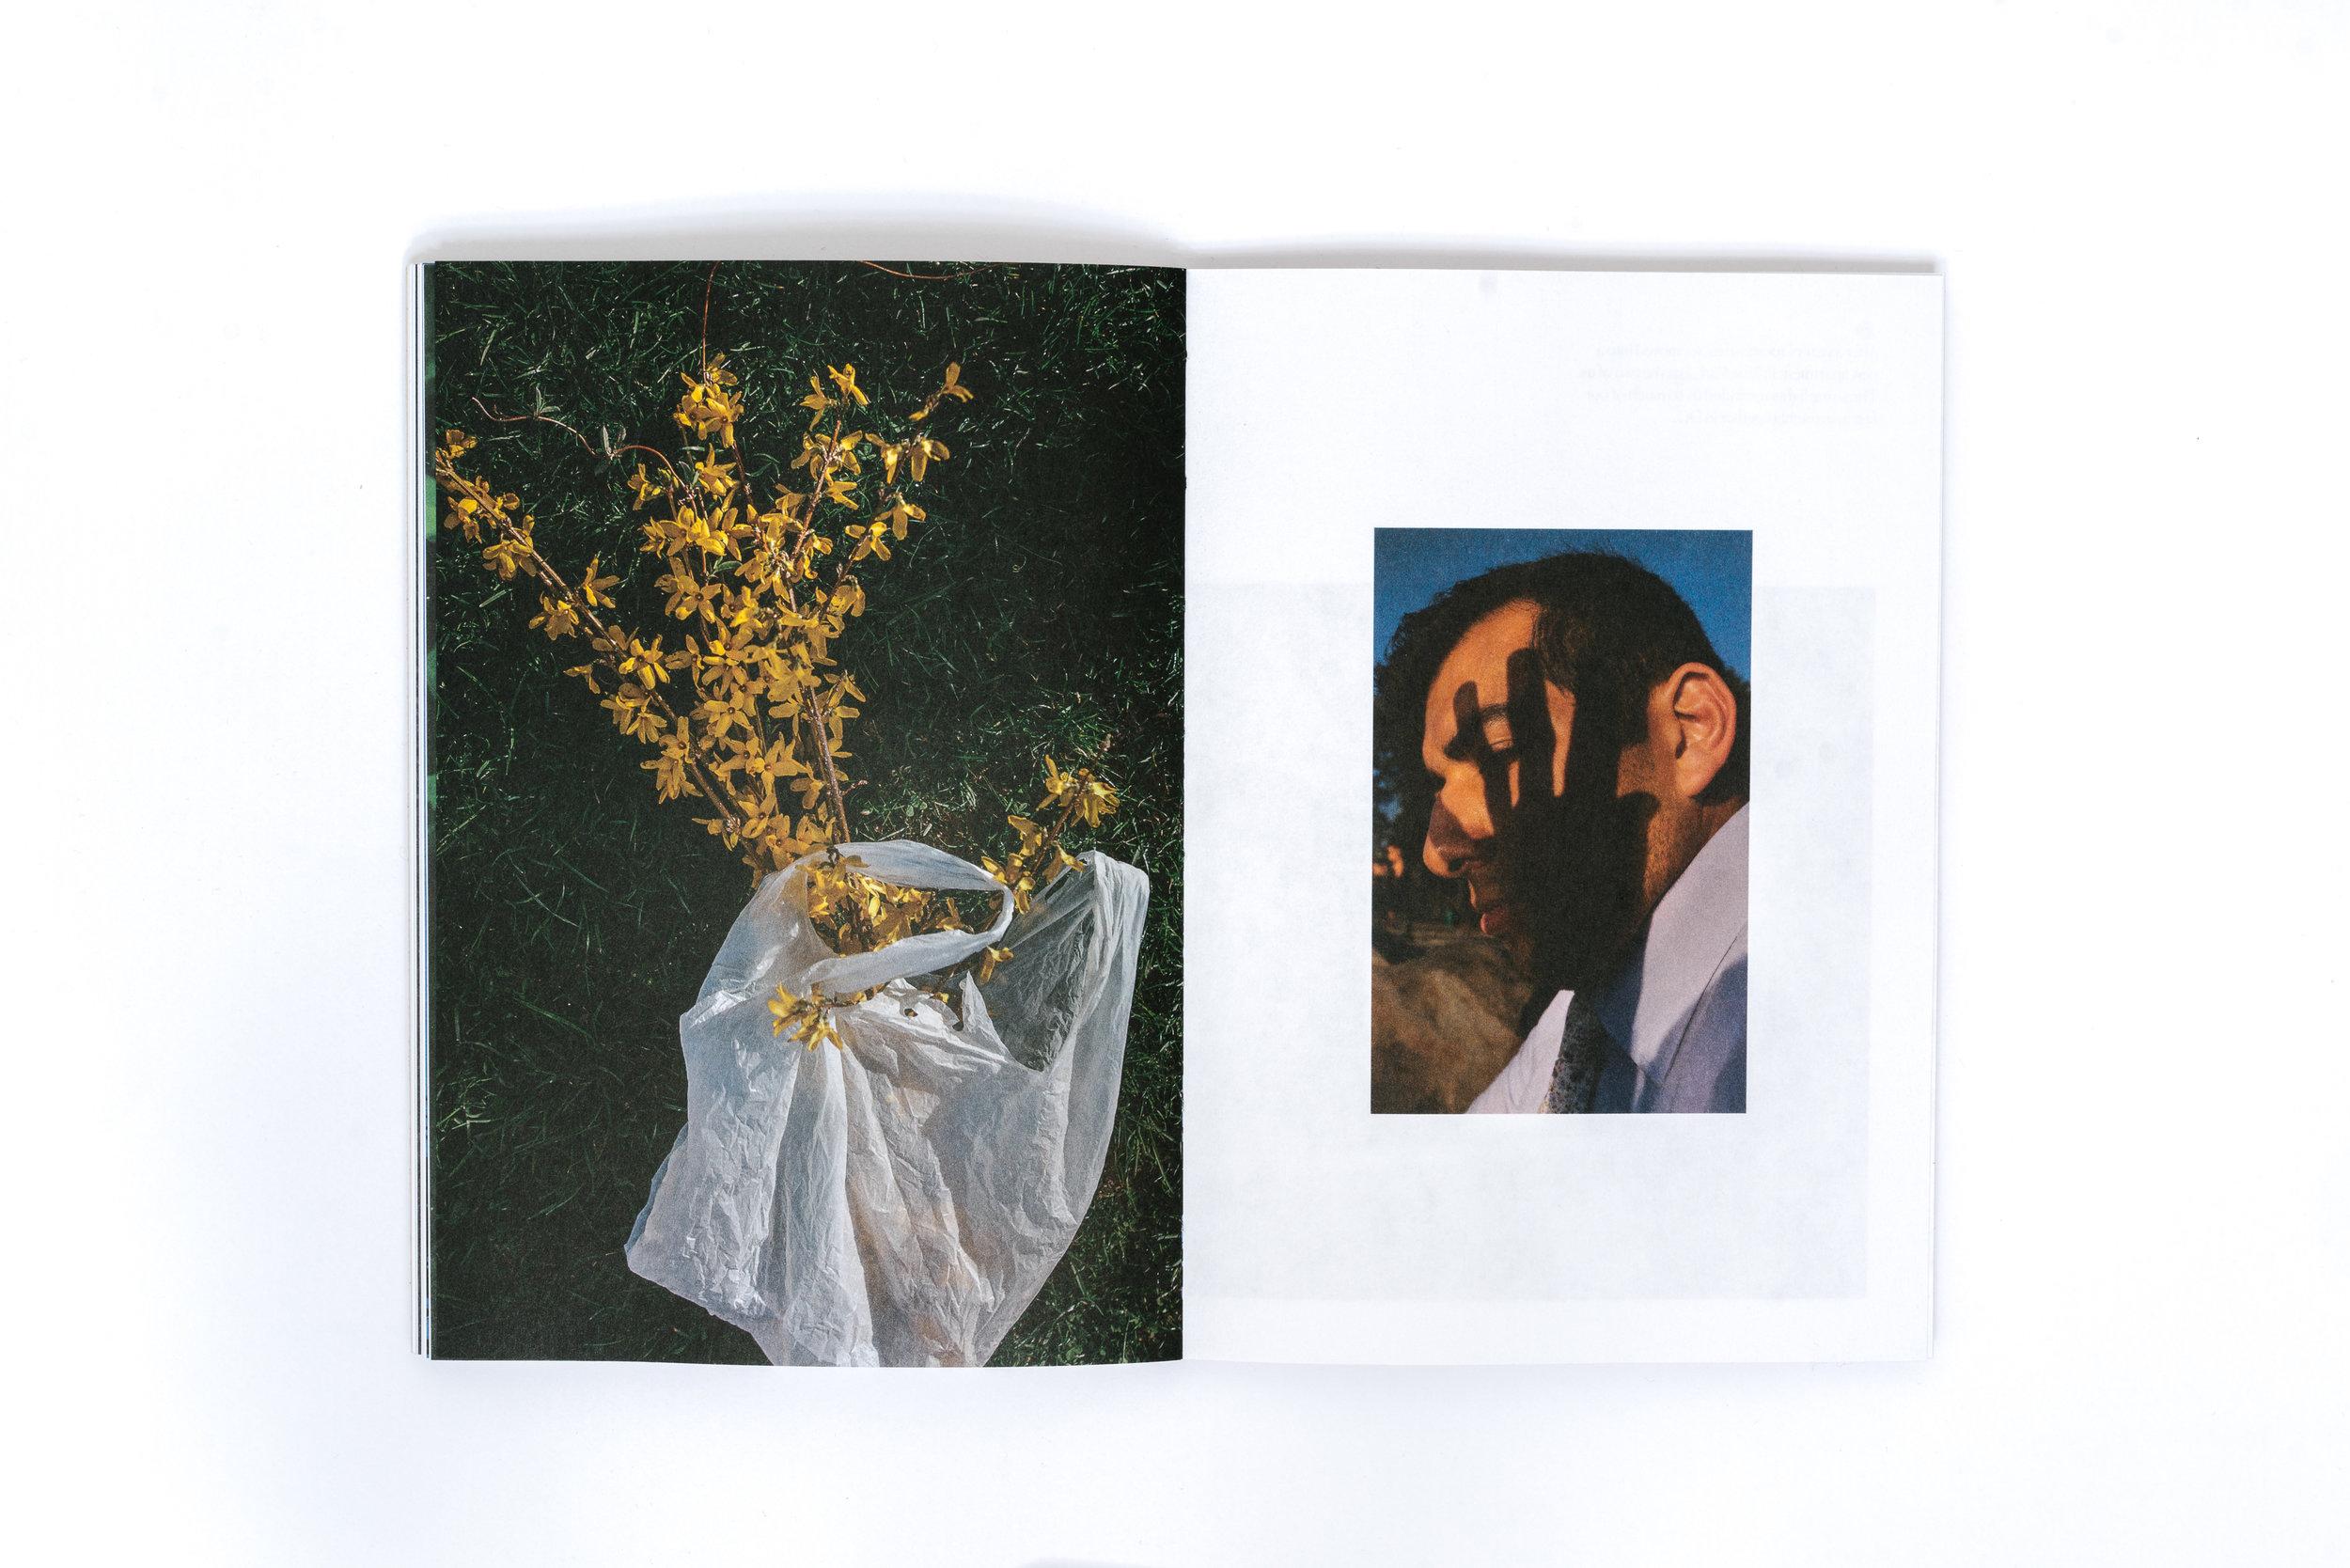 When-We-Were-Strangers_Jake-Naughton_Juan-Sosa_Book-Views-06181.jpg